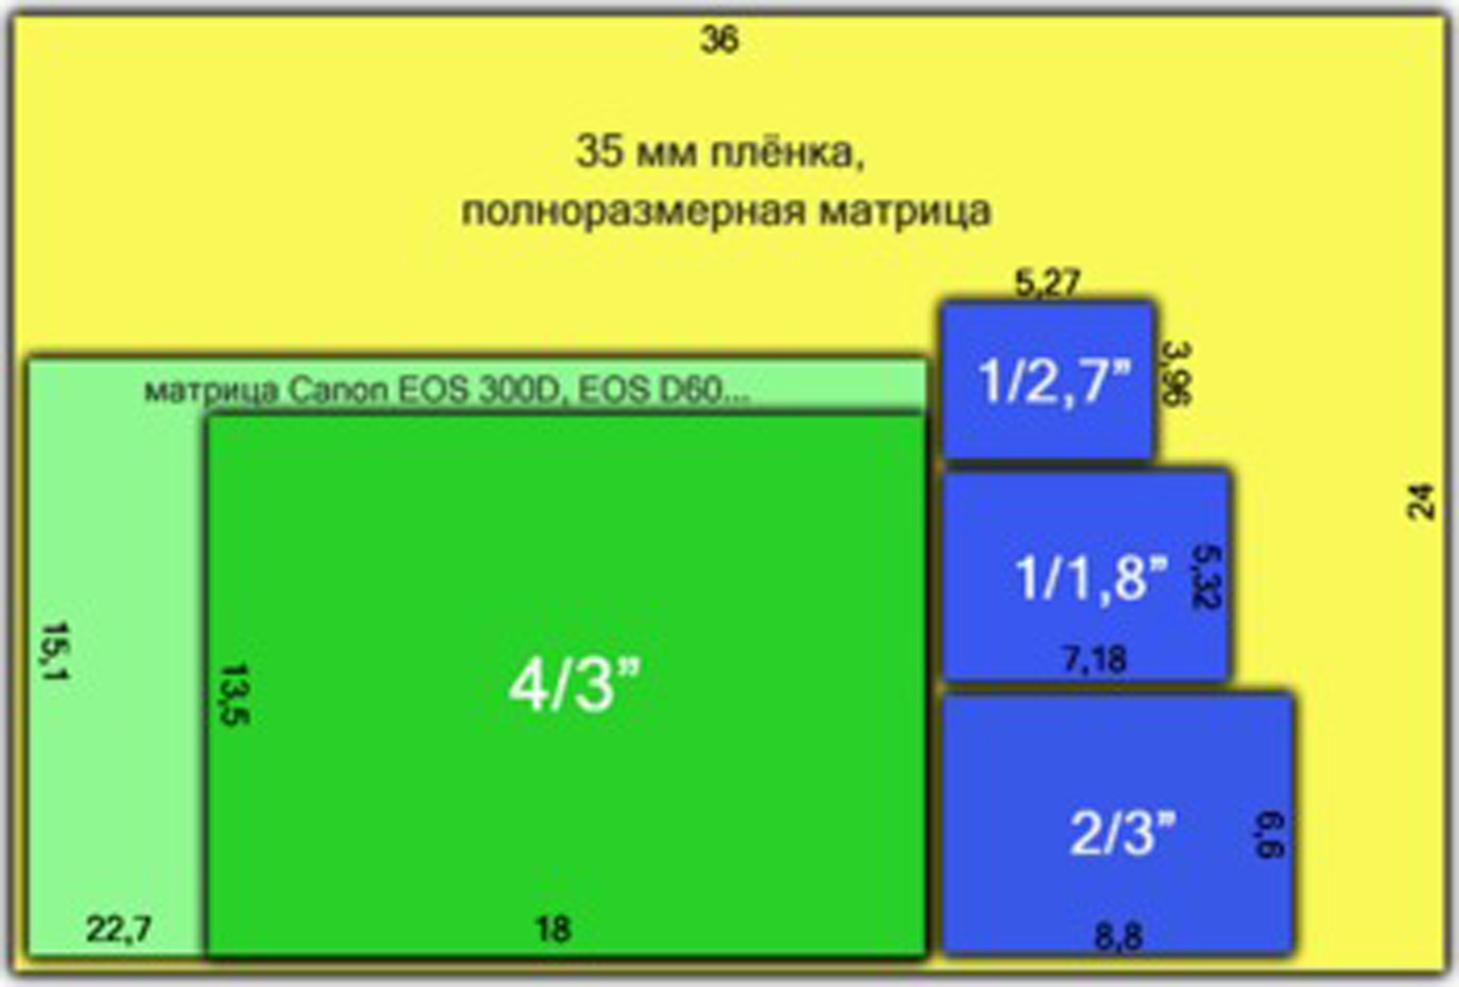 https://upload.wikimedia.org/wikipedia/commons/9/9d/%D0%A1%D0%BE%D0%BE%D1%82%D0%BD%D0%BE%D1%88%D0%B5%D0%BD%D0%B8%D0%B5_%D0%BC%D0%B0%D1%82%D1%80%D0%B8%D1%86.jpg